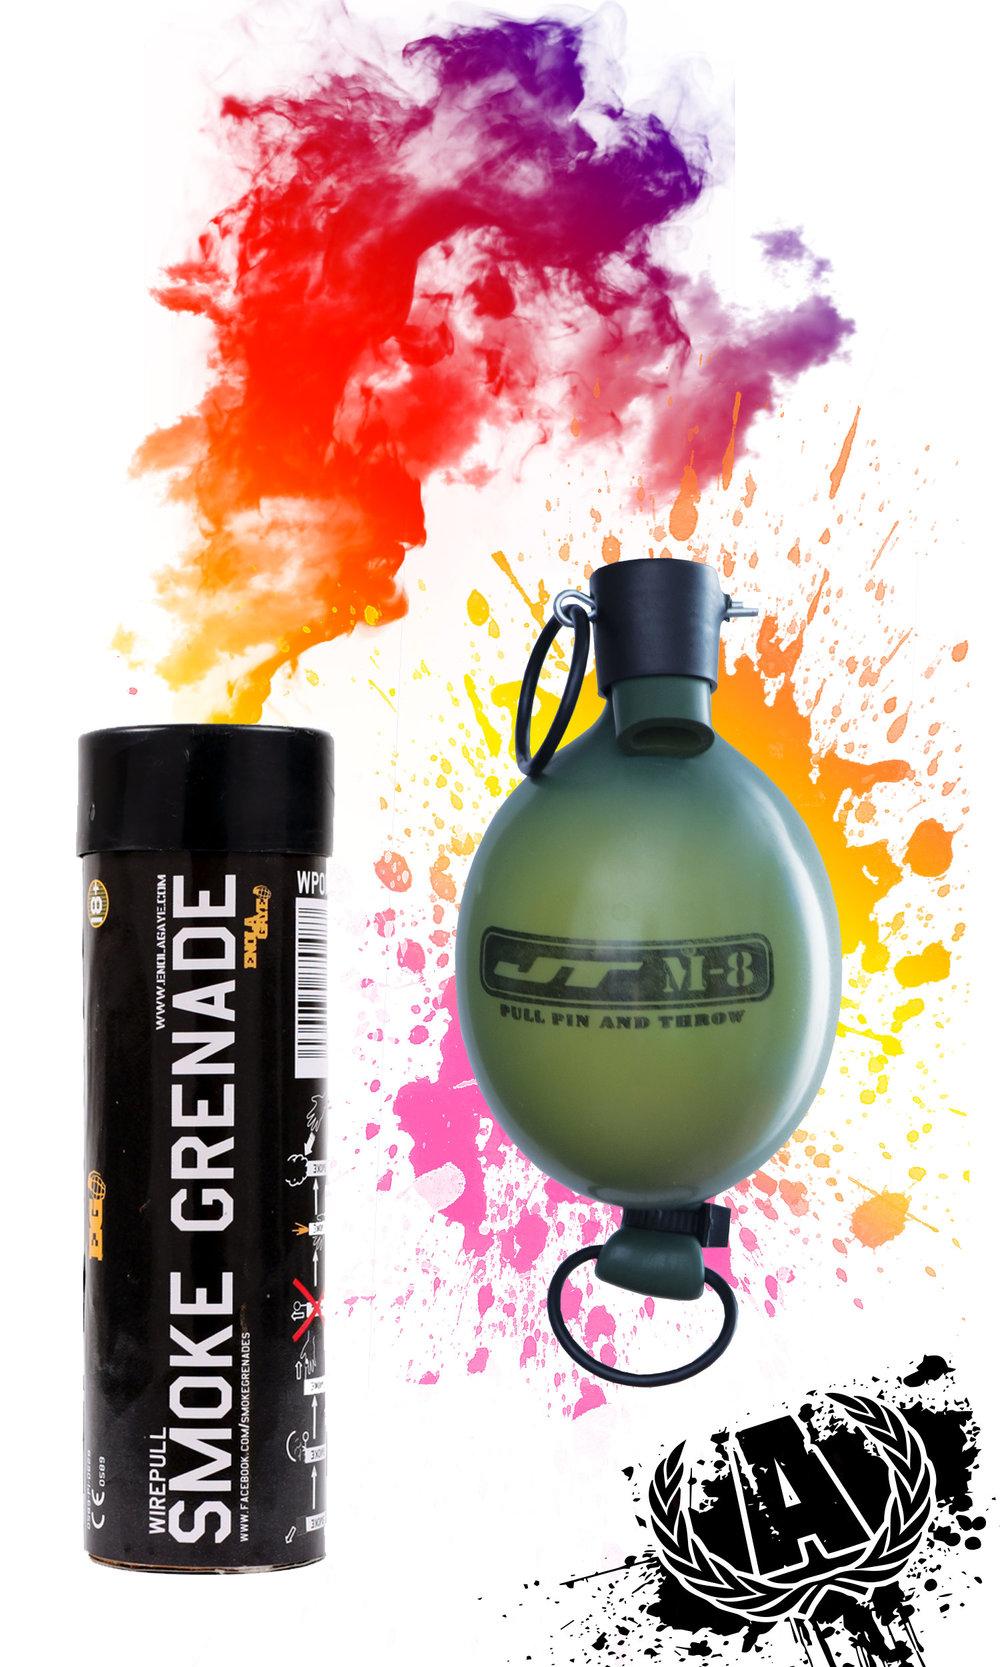 Smoke or Paint Grenades     Standard Smoke Grenade  $9.99   XL Smoke Grenade  $14.99  Paint Grenade  $9.99